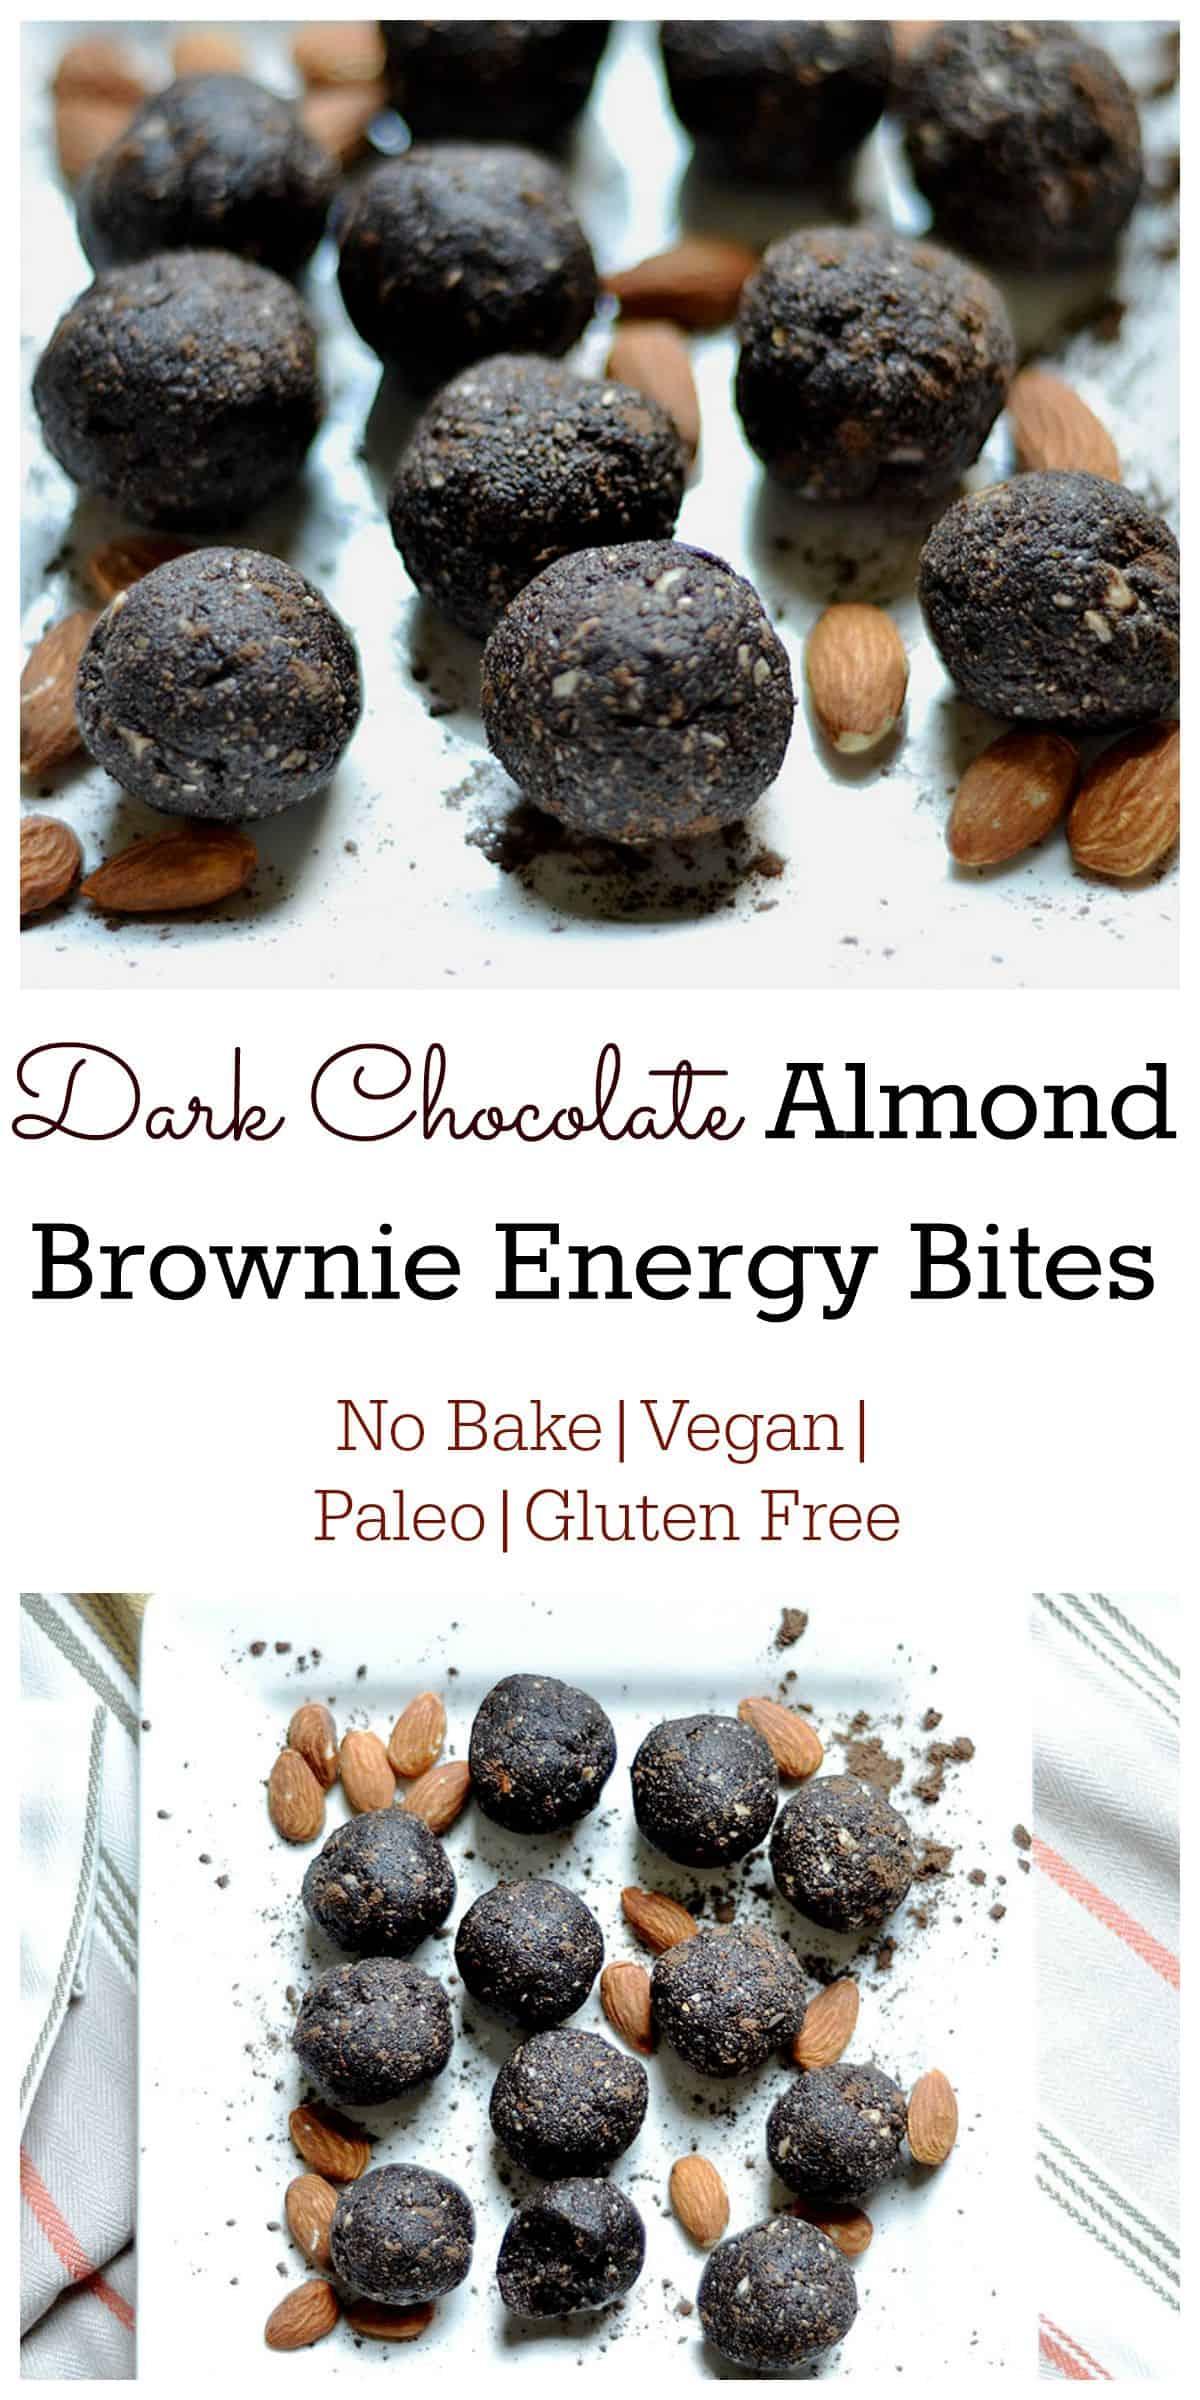 Dark Chocolate Almond Brownie Energy Bites Wholesomelicious